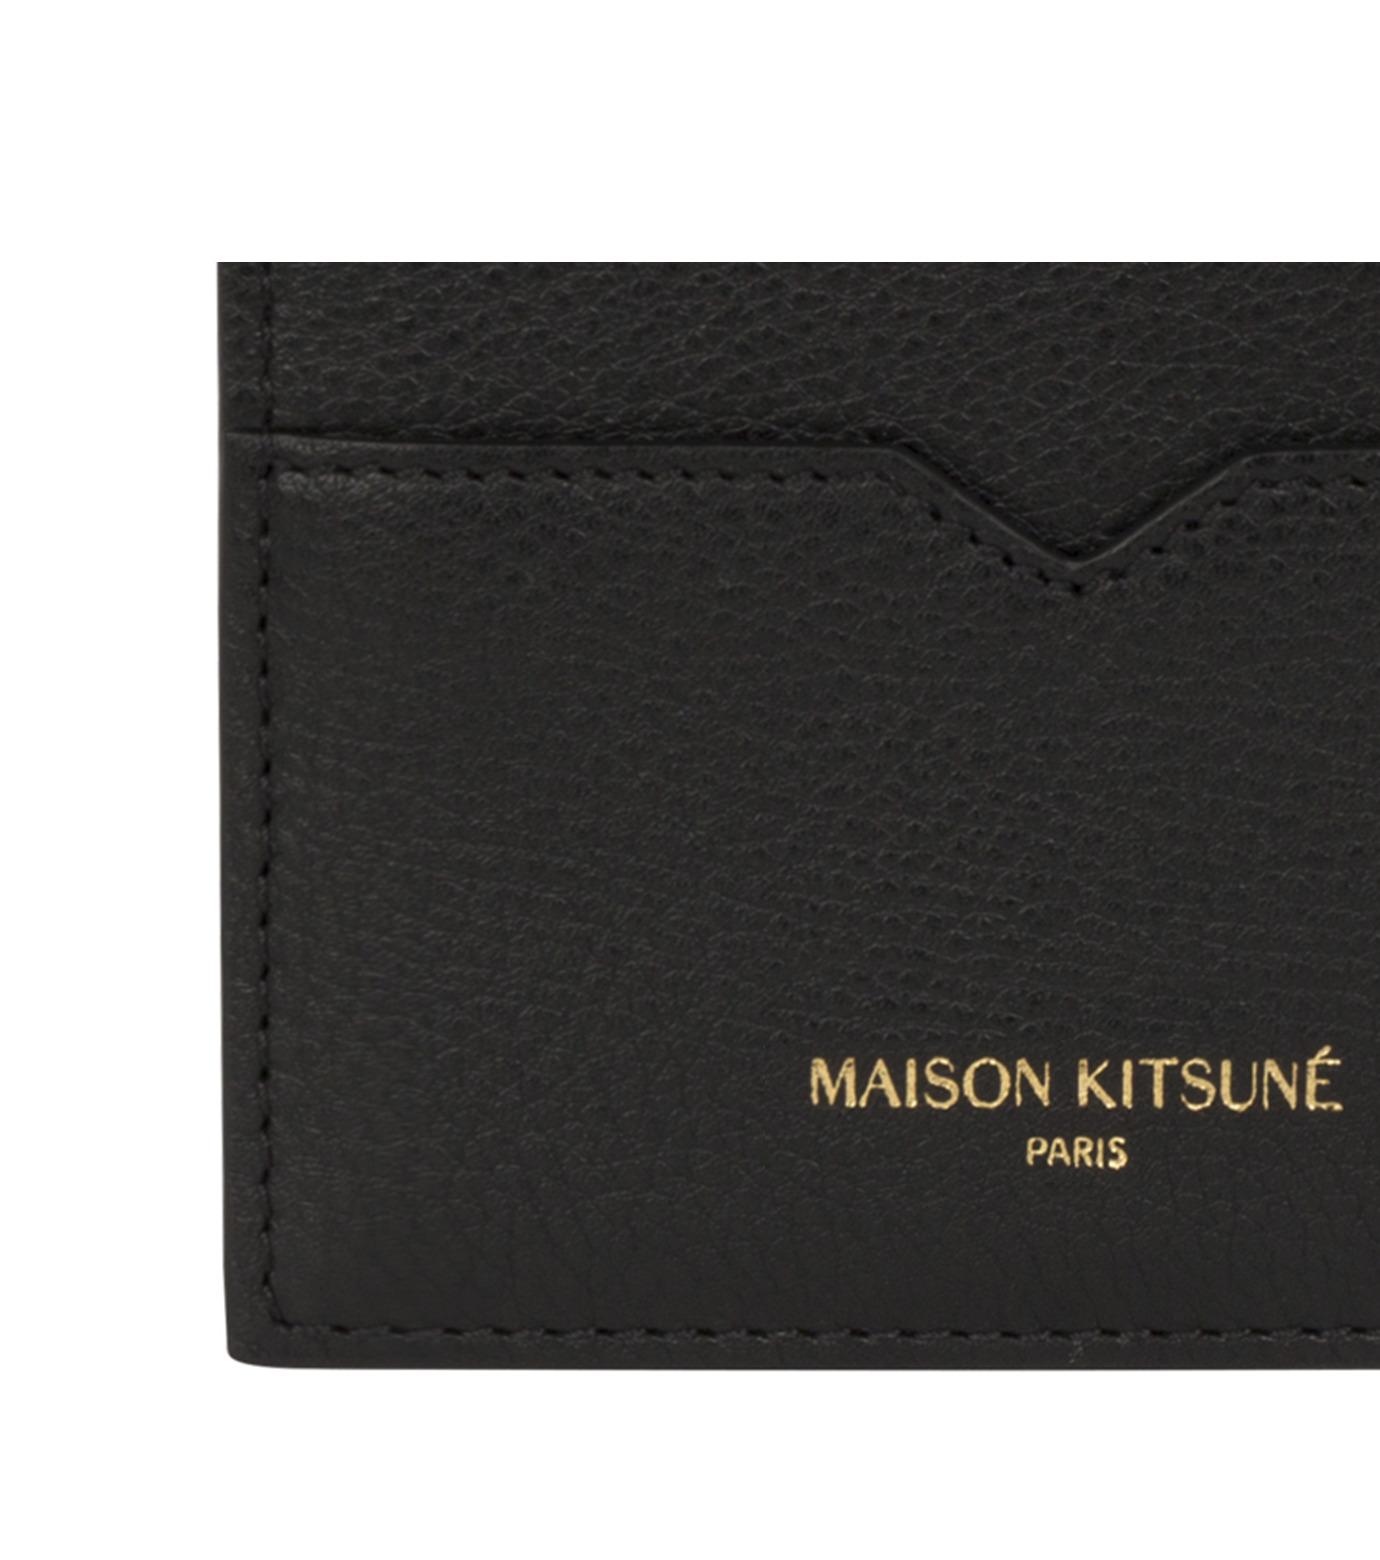 MAISON KITSUNÉ(メゾンキツネ)のcard holder-BLACK(WALLETS/WALLETS)-KUZ8600-13 拡大詳細画像2